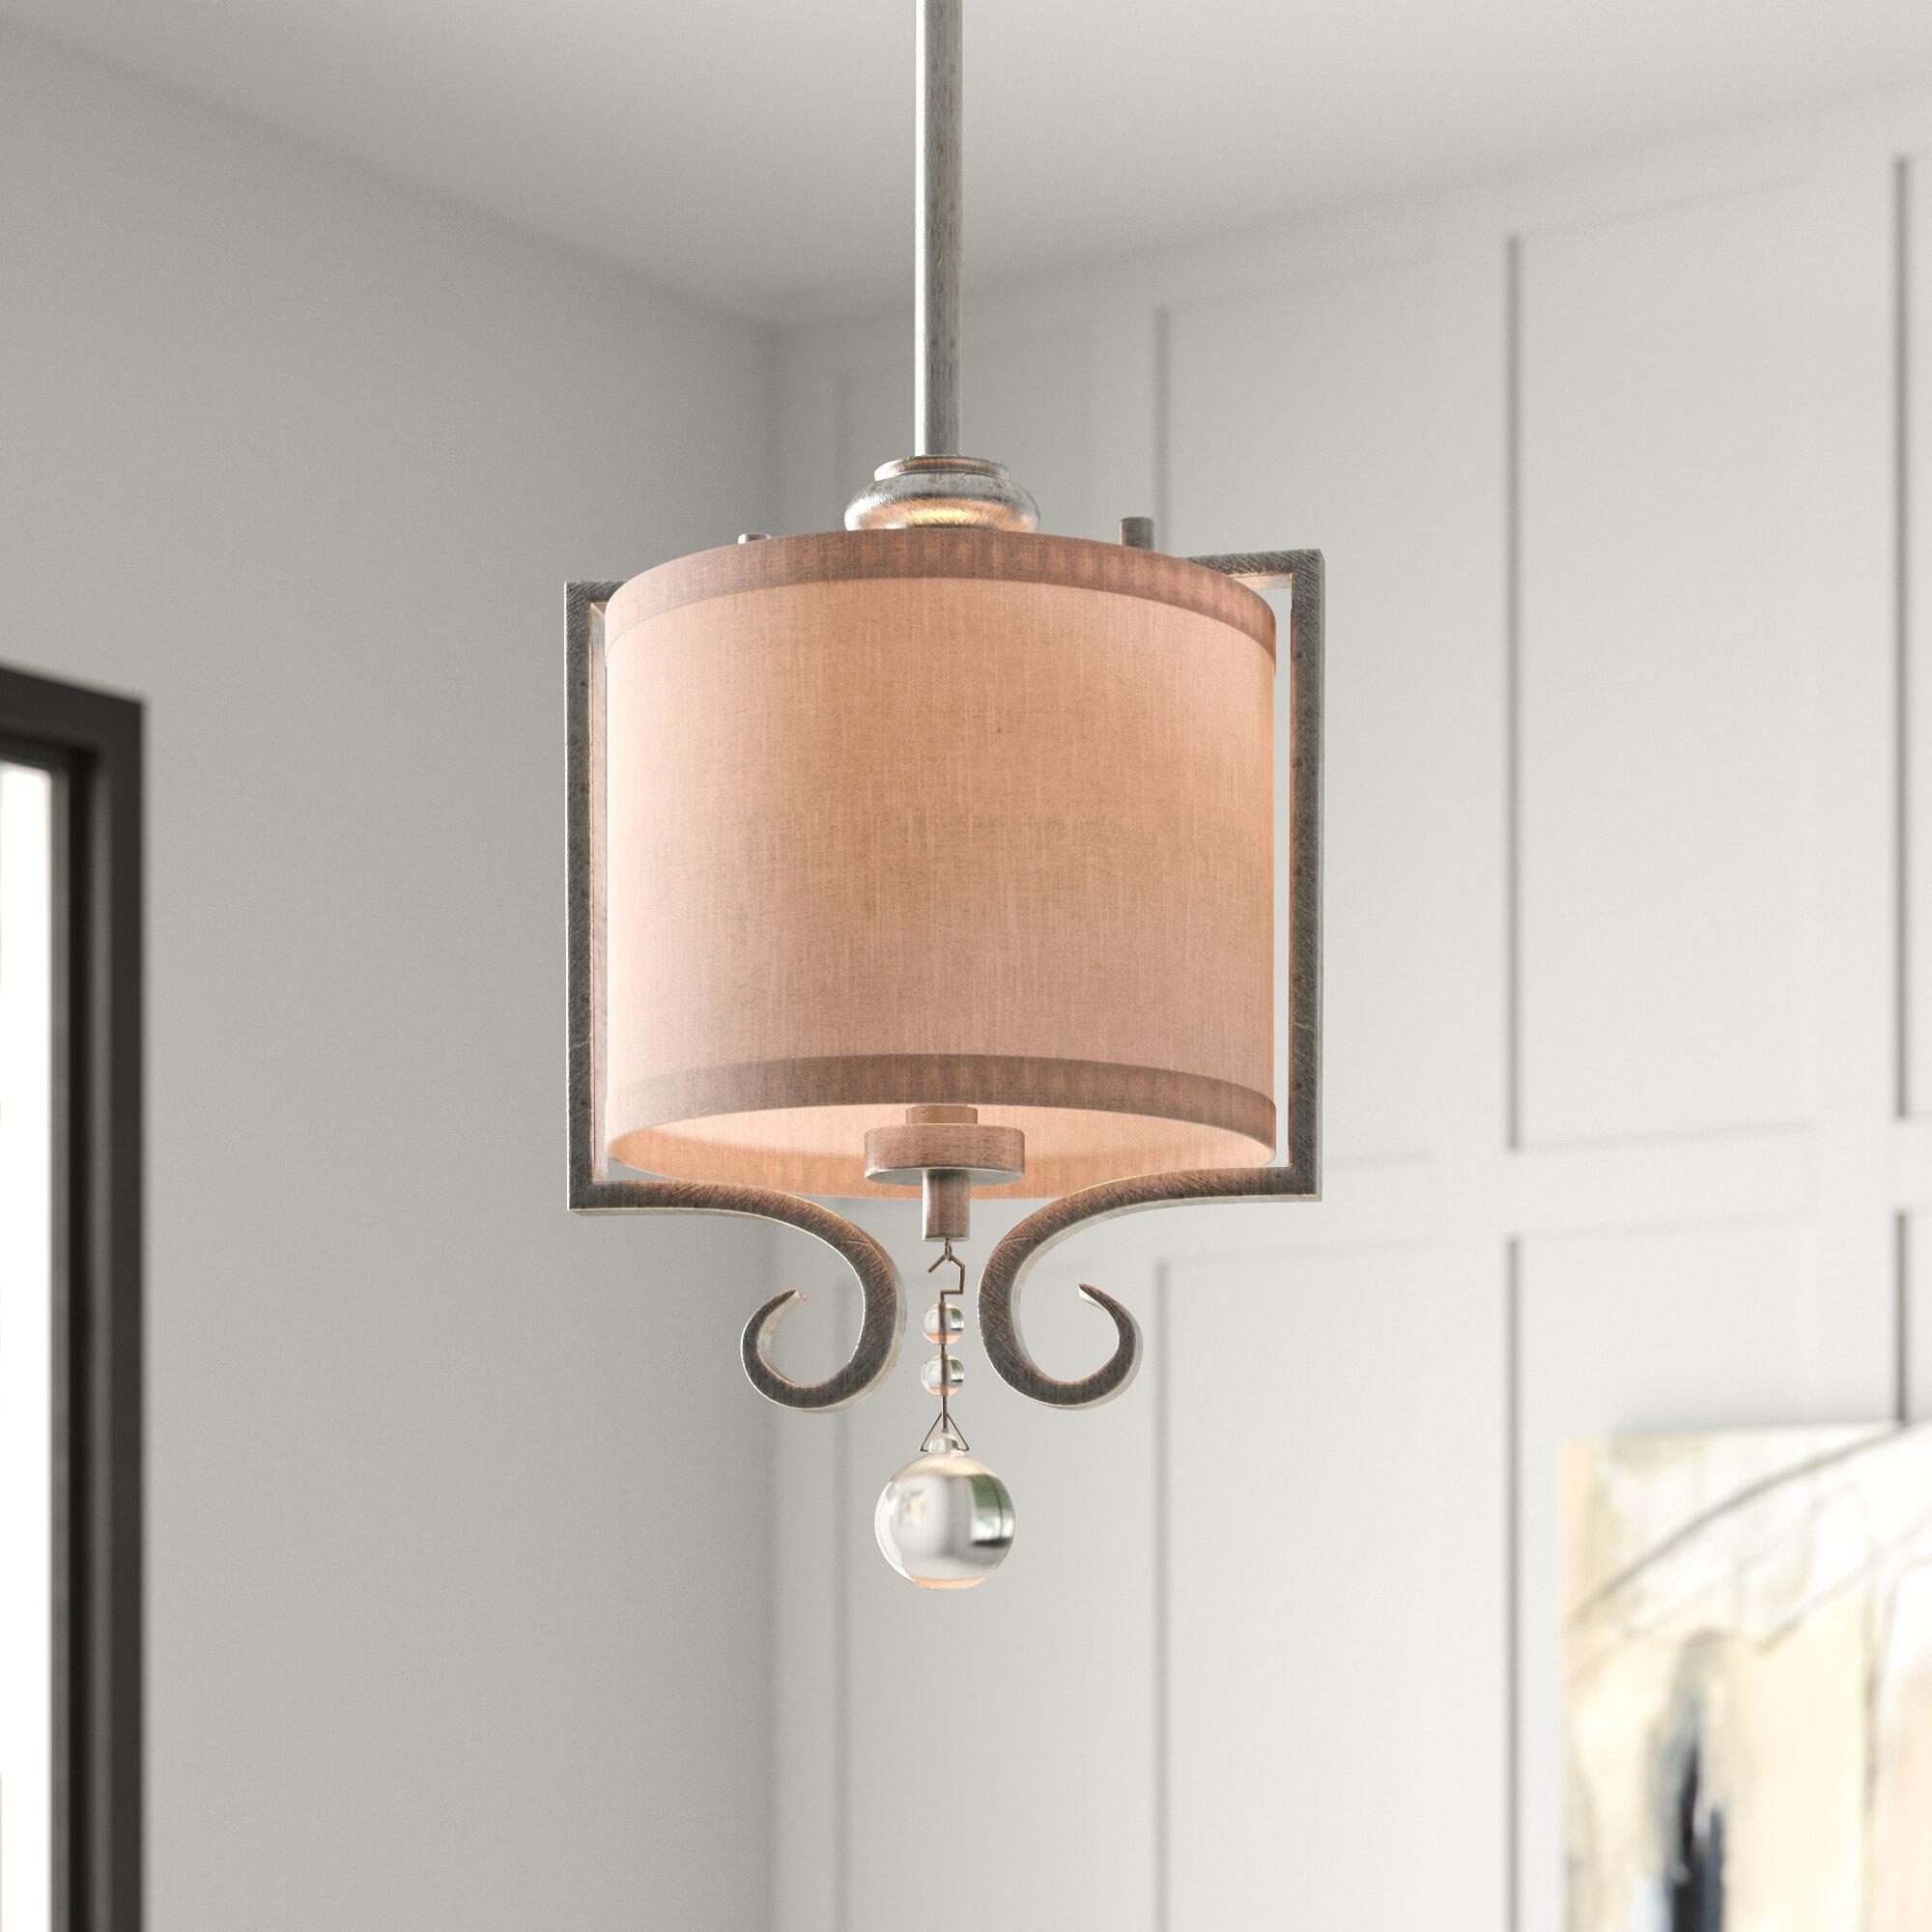 Beasley 1-Light Single Drum Pendant in Hermione 1-Light Single Drum Pendants (Image 3 of 30)